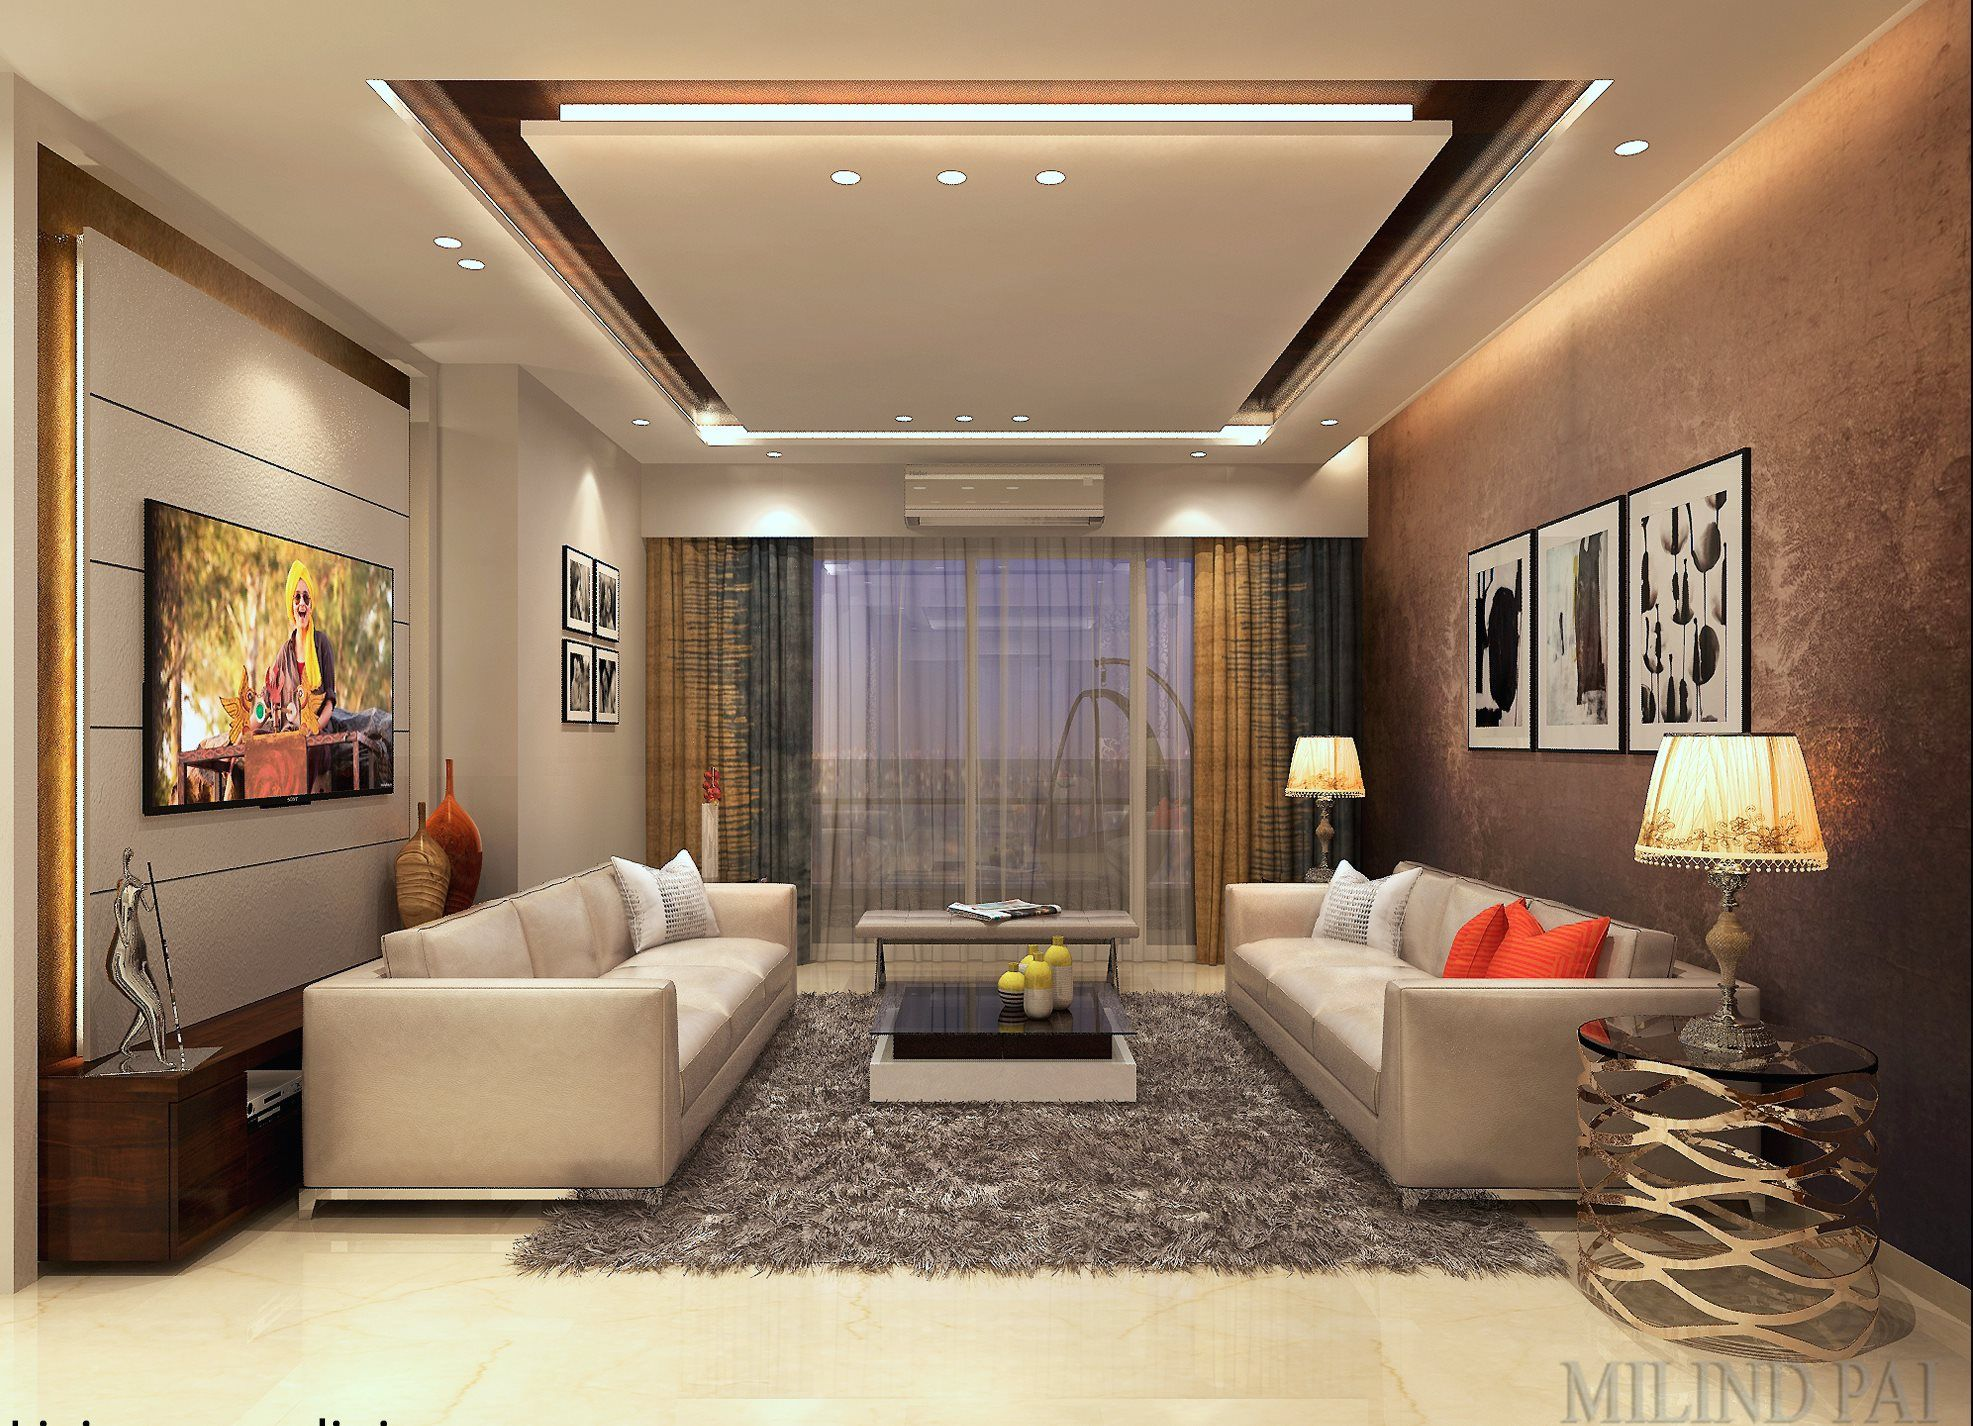 Design of a living room in Suburban Mumbai, for more ...